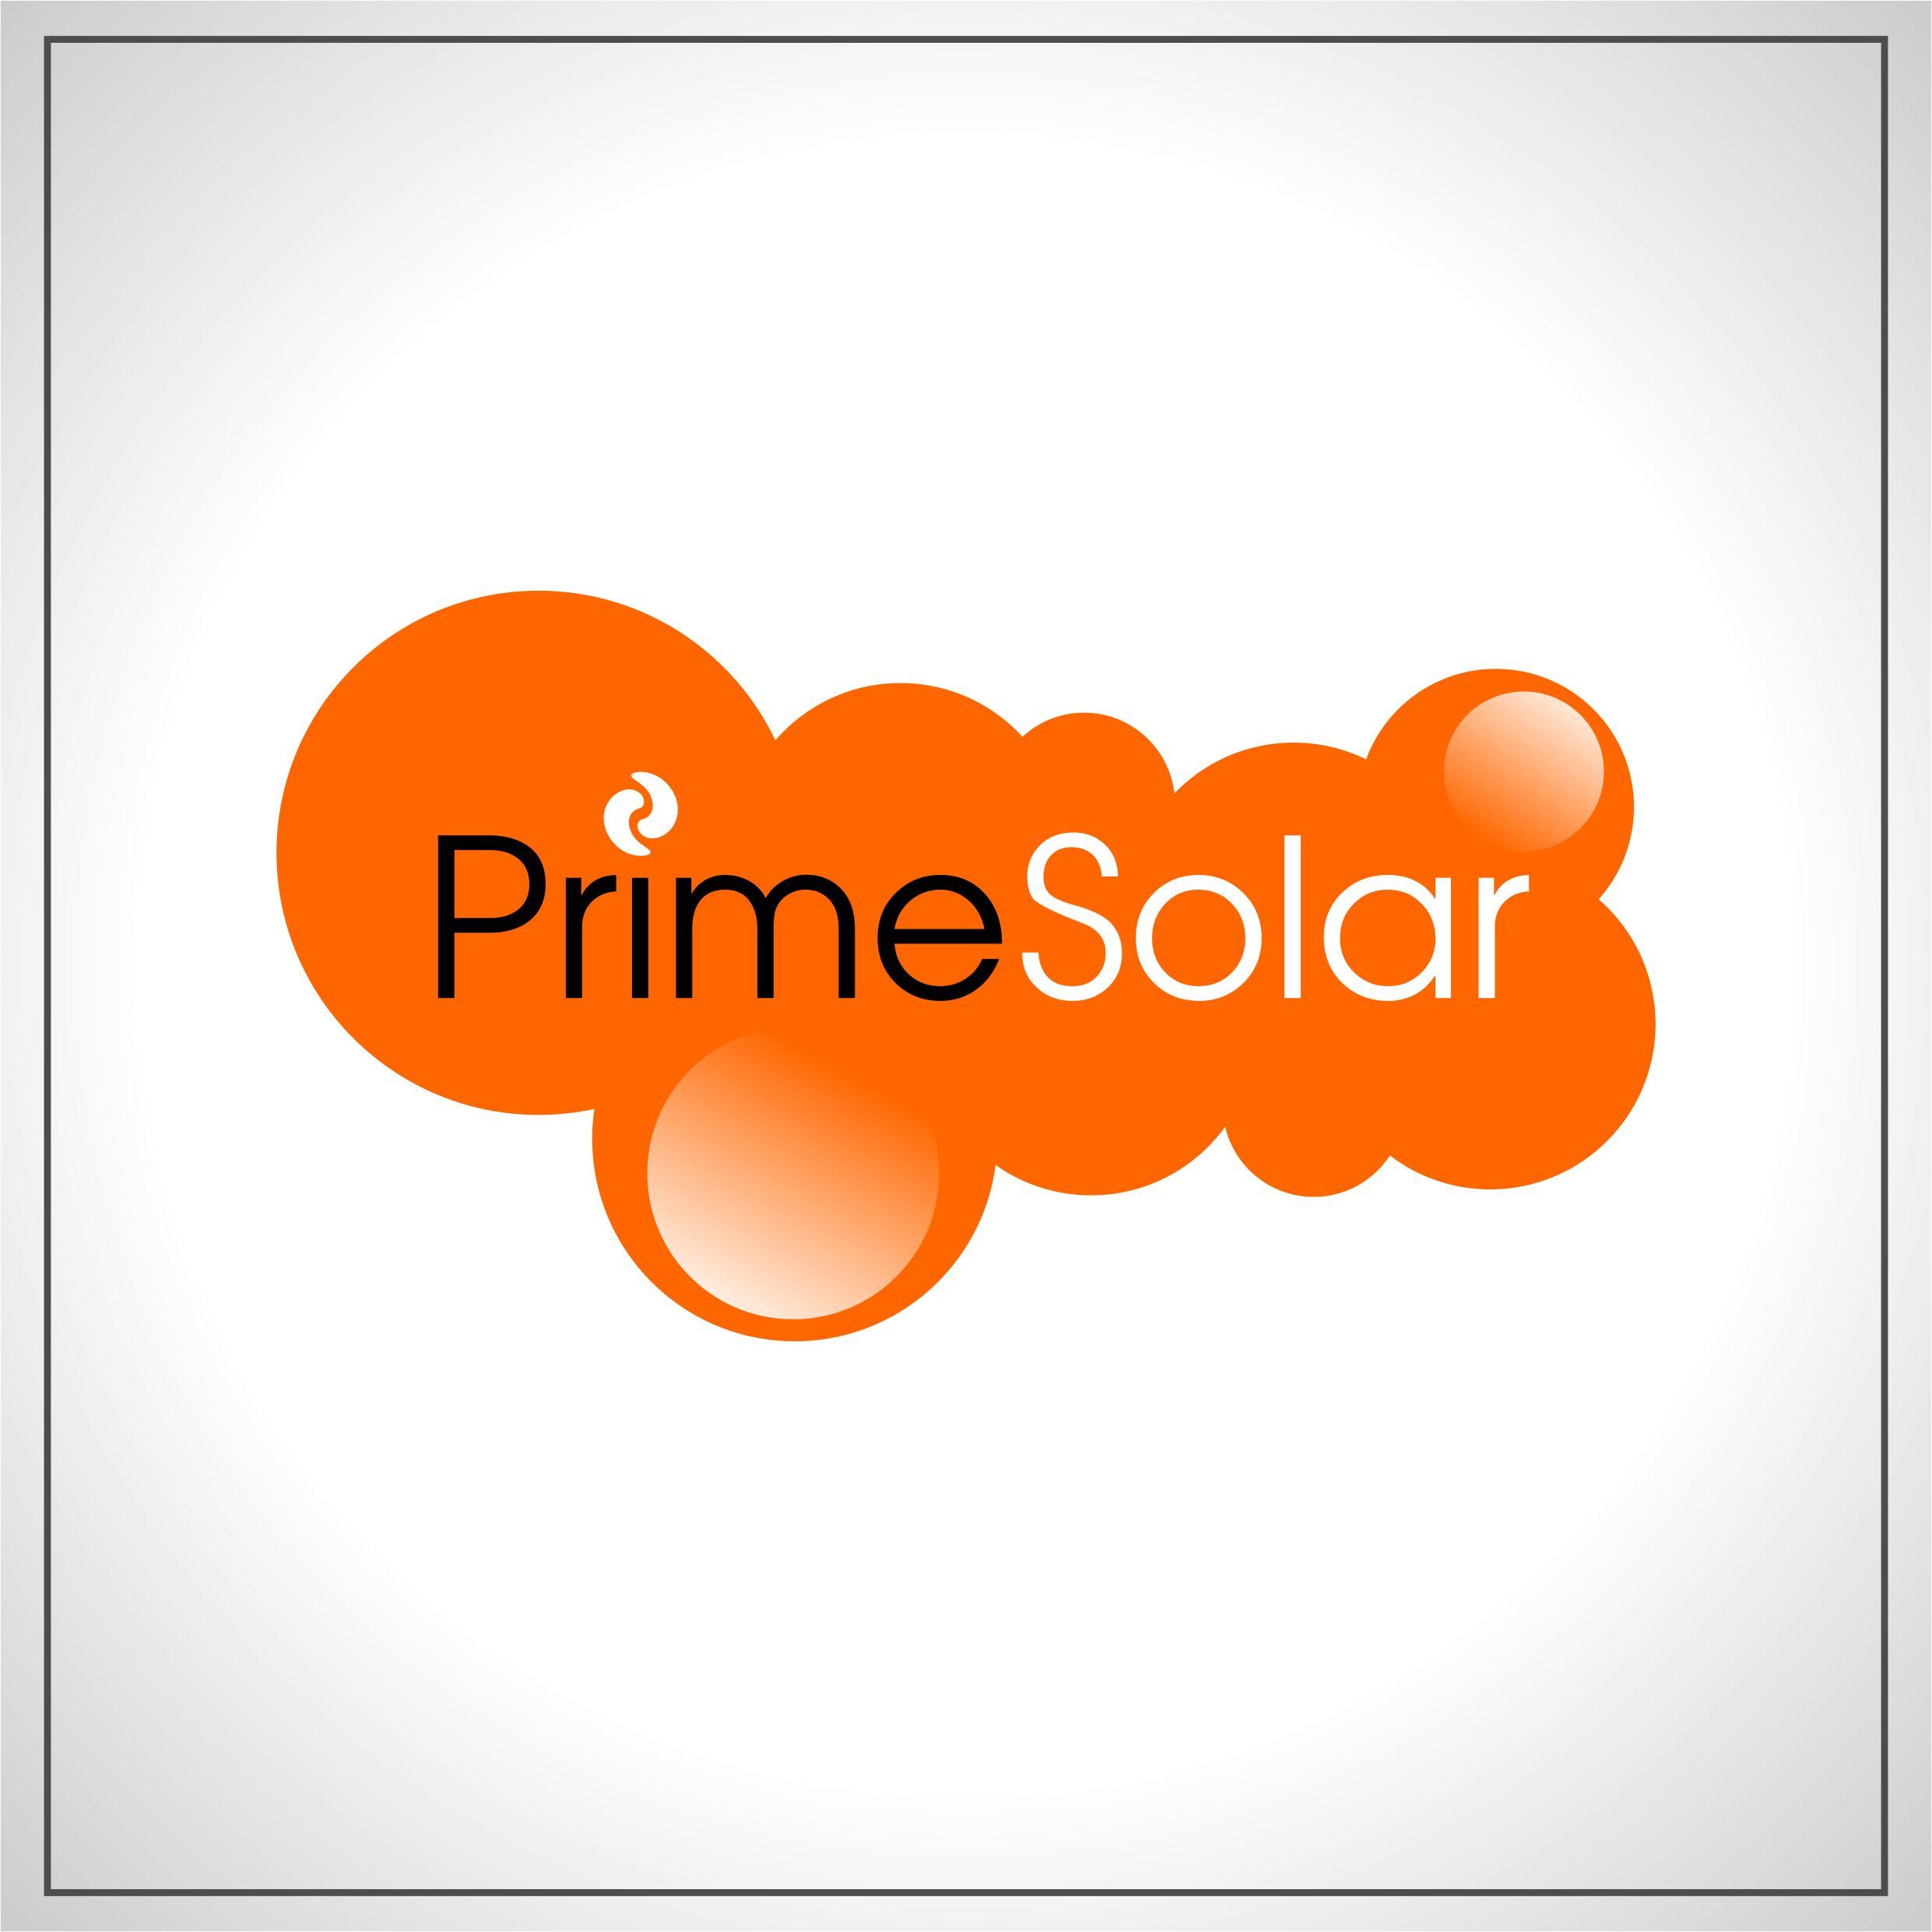 Логотип компании PrimeSolar [UPD: 16:45 15/12/11] фото f_4eef184fd6f0a.jpg